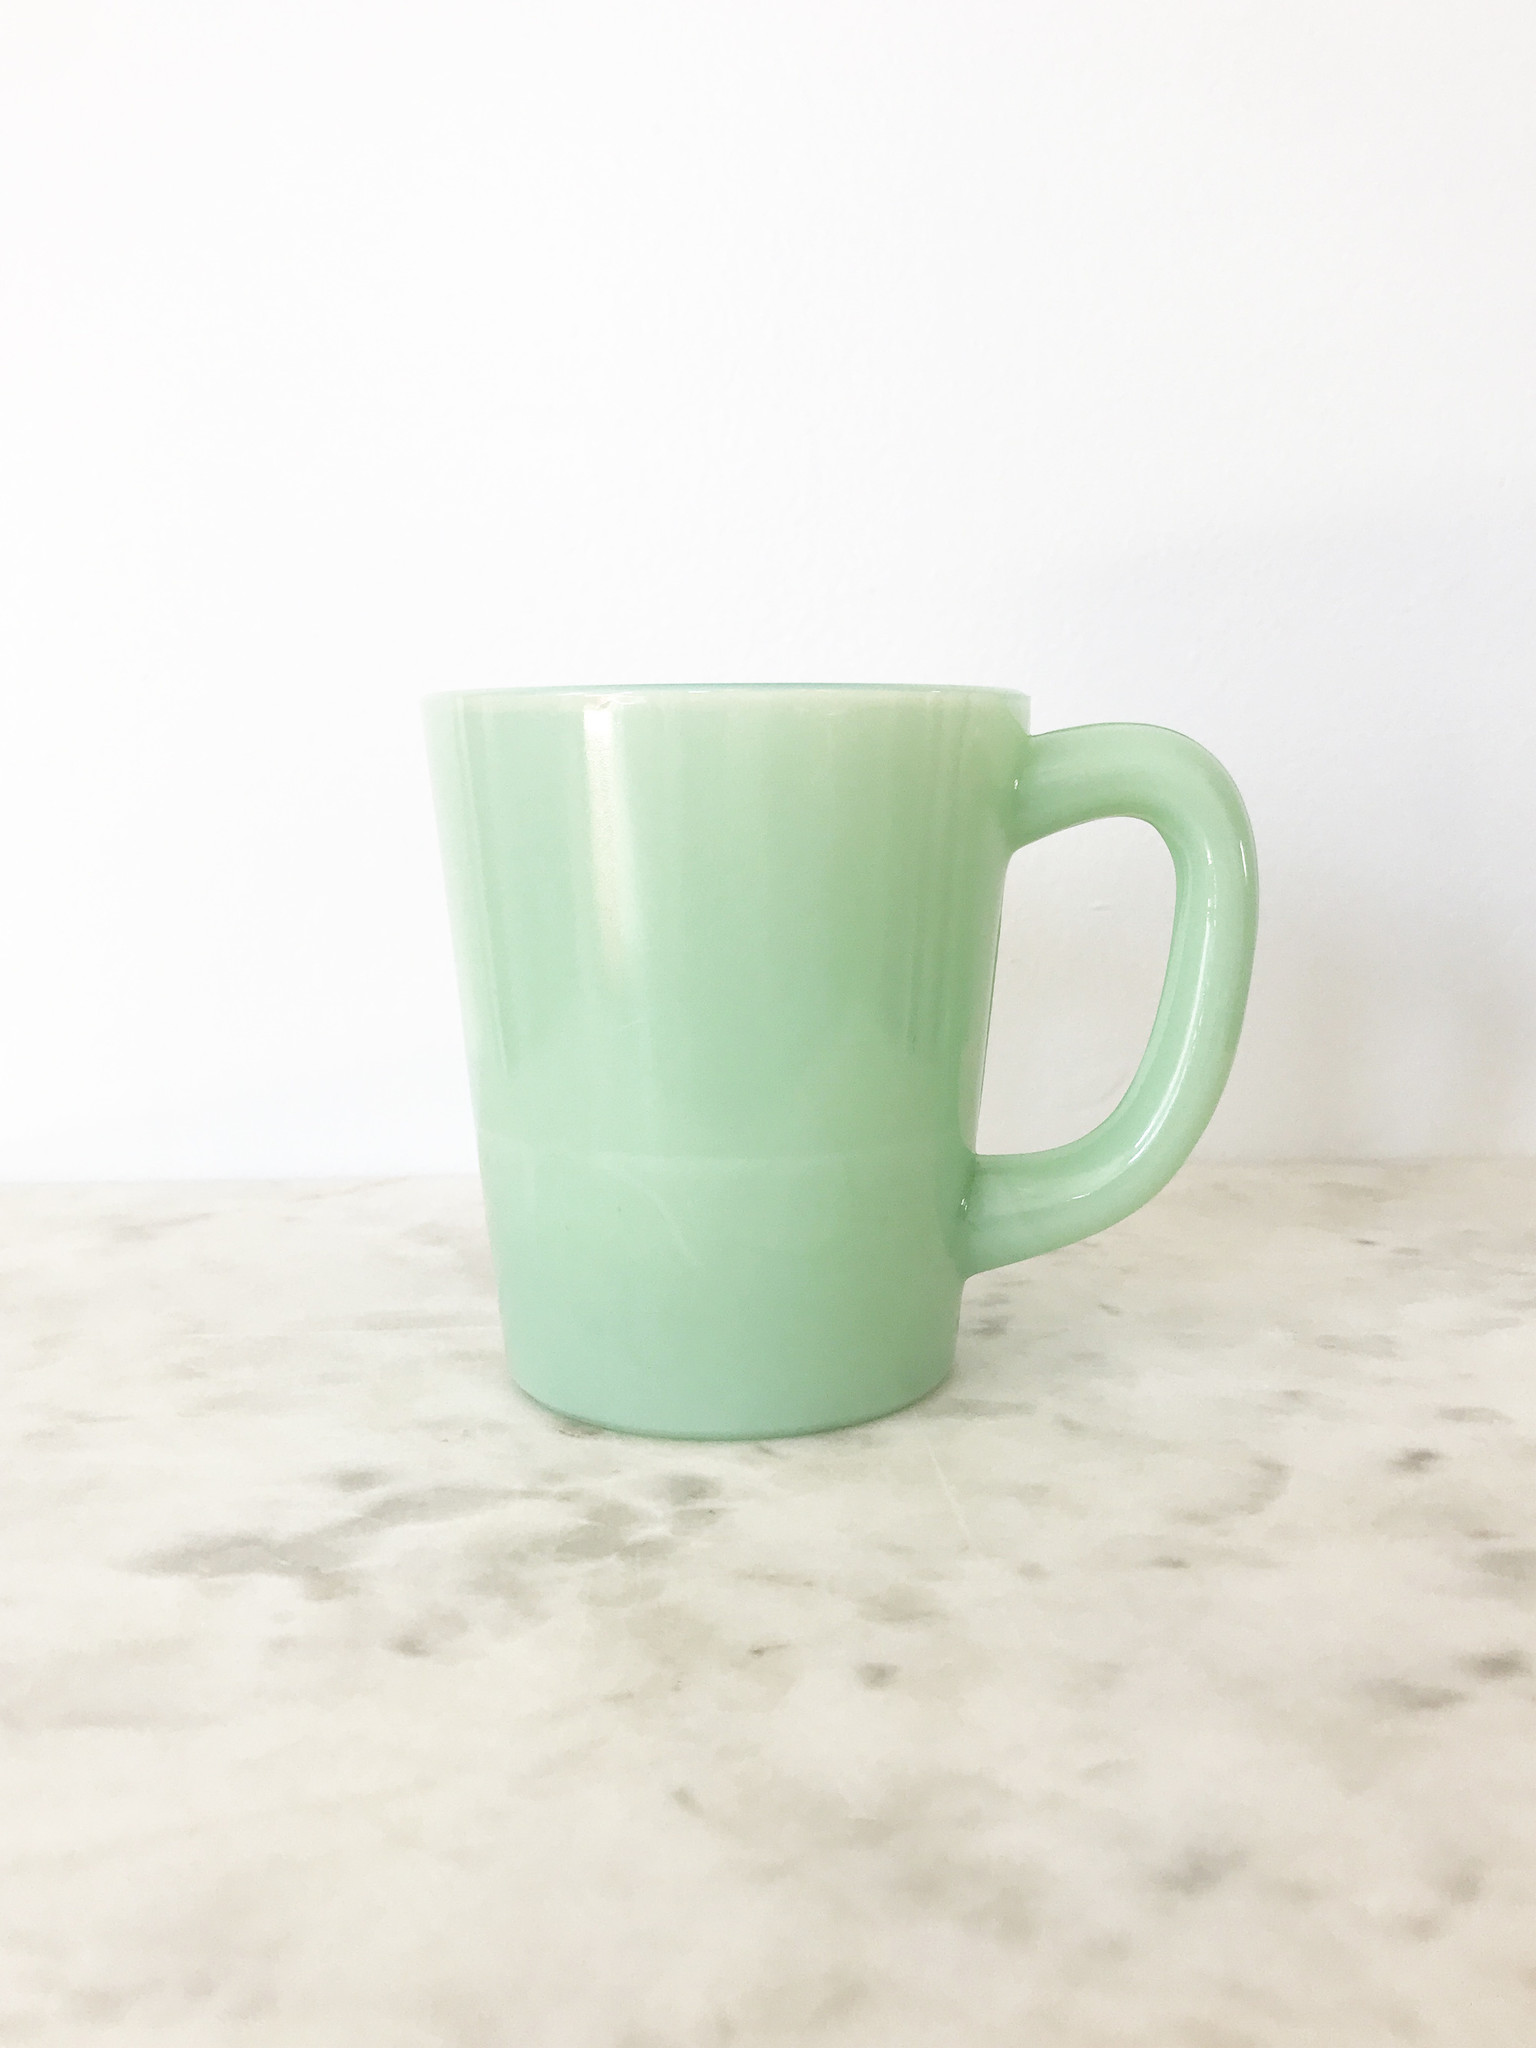 Mosser Glass Mug, 9 oz.-1